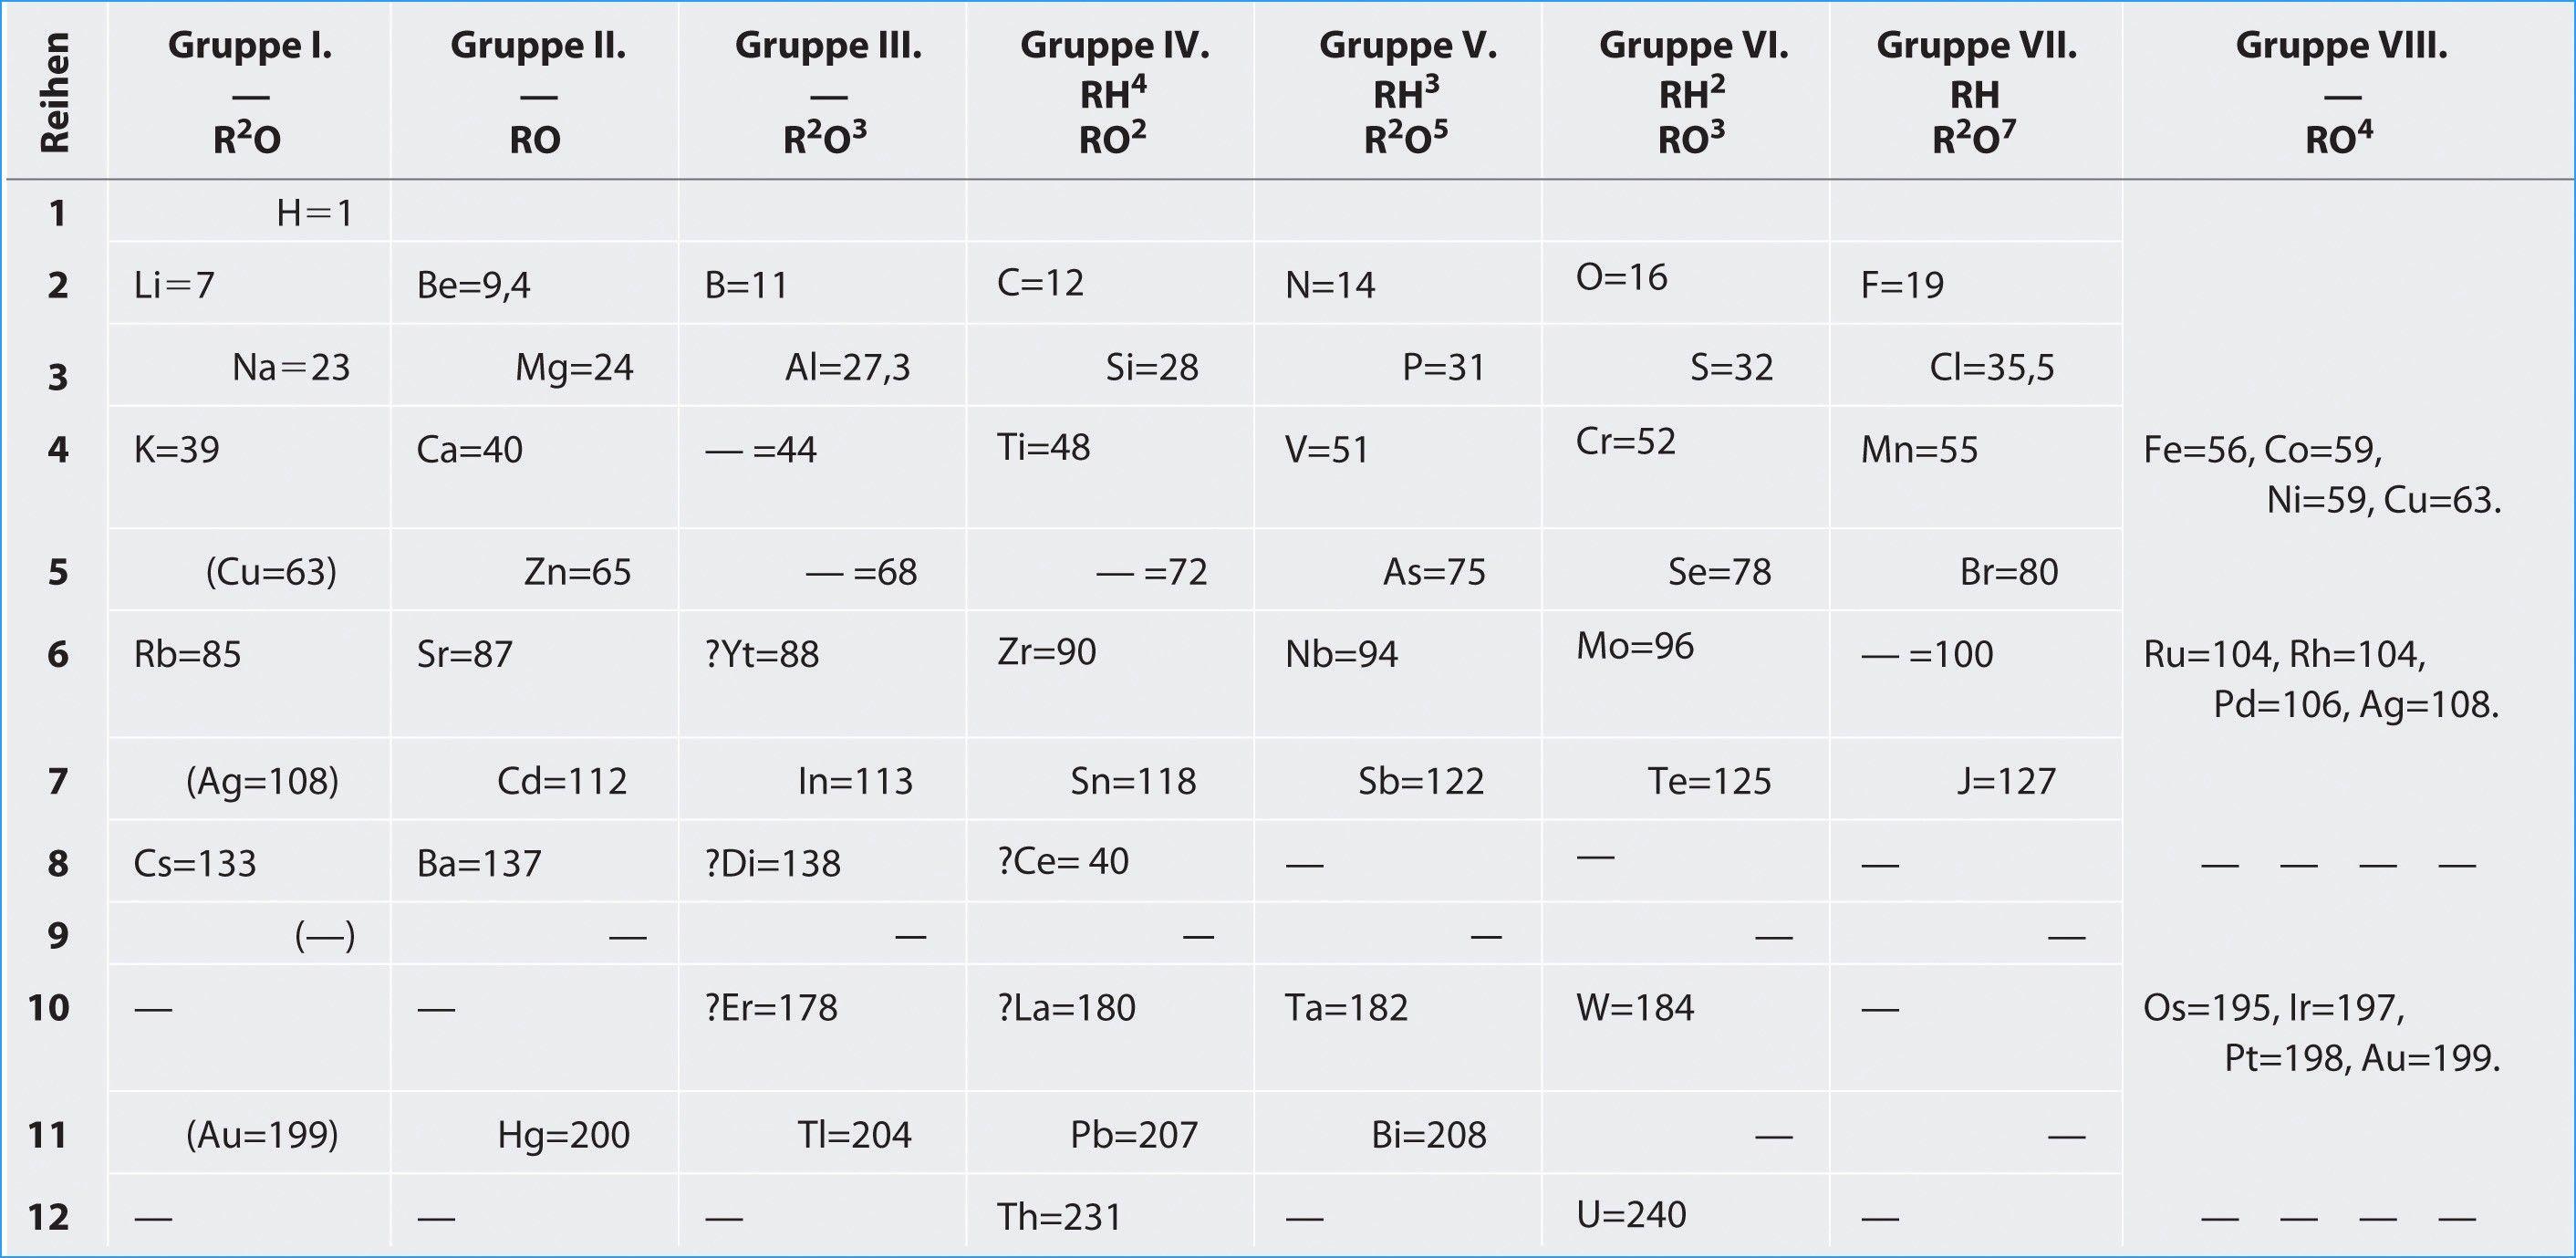 New Periodic Table Column Names